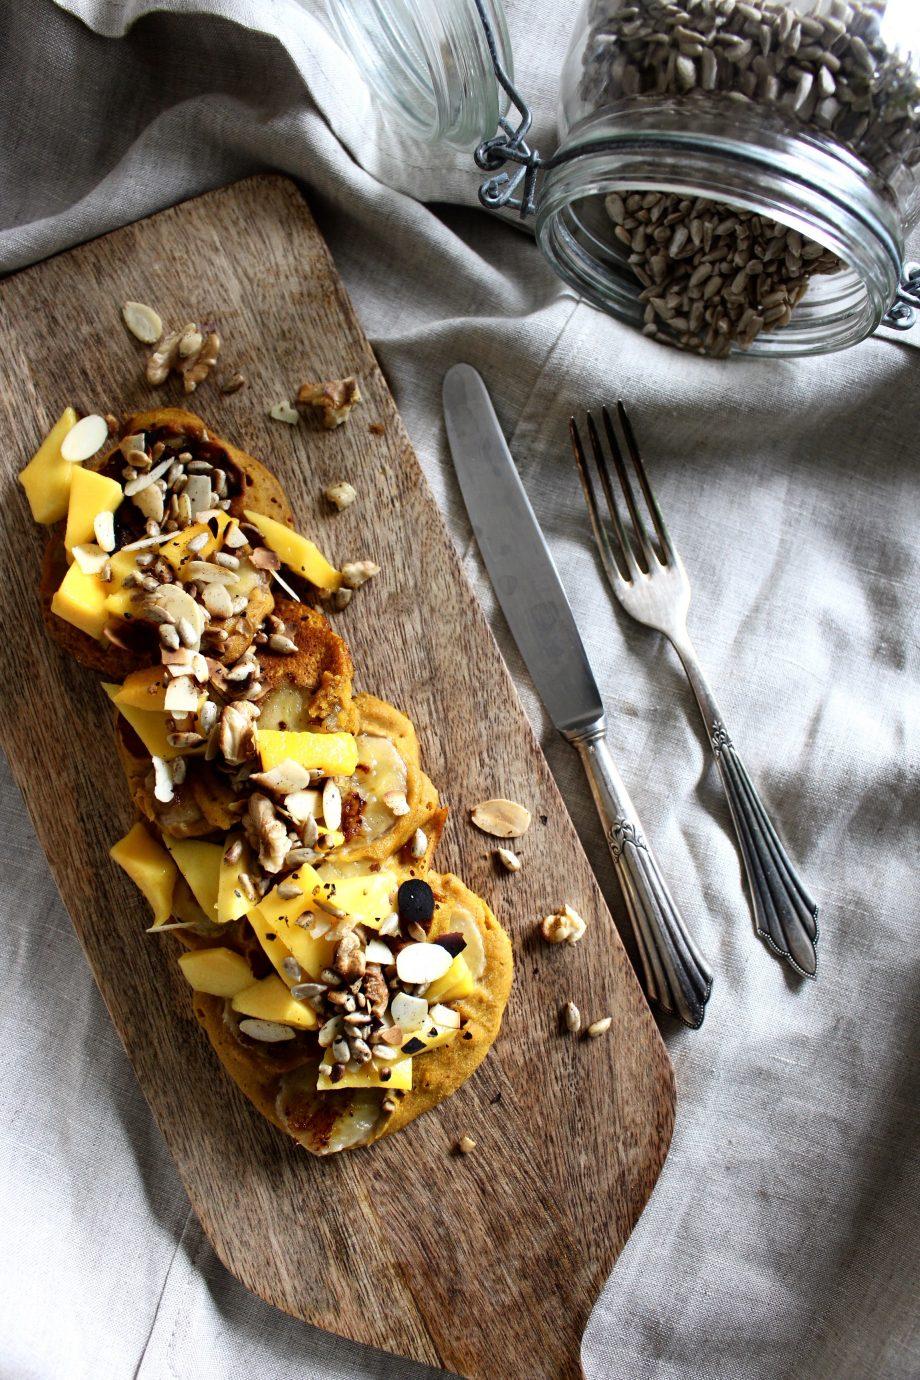 Pumpkin-Banana-Pancakes with fresh Mango |11.01.2018